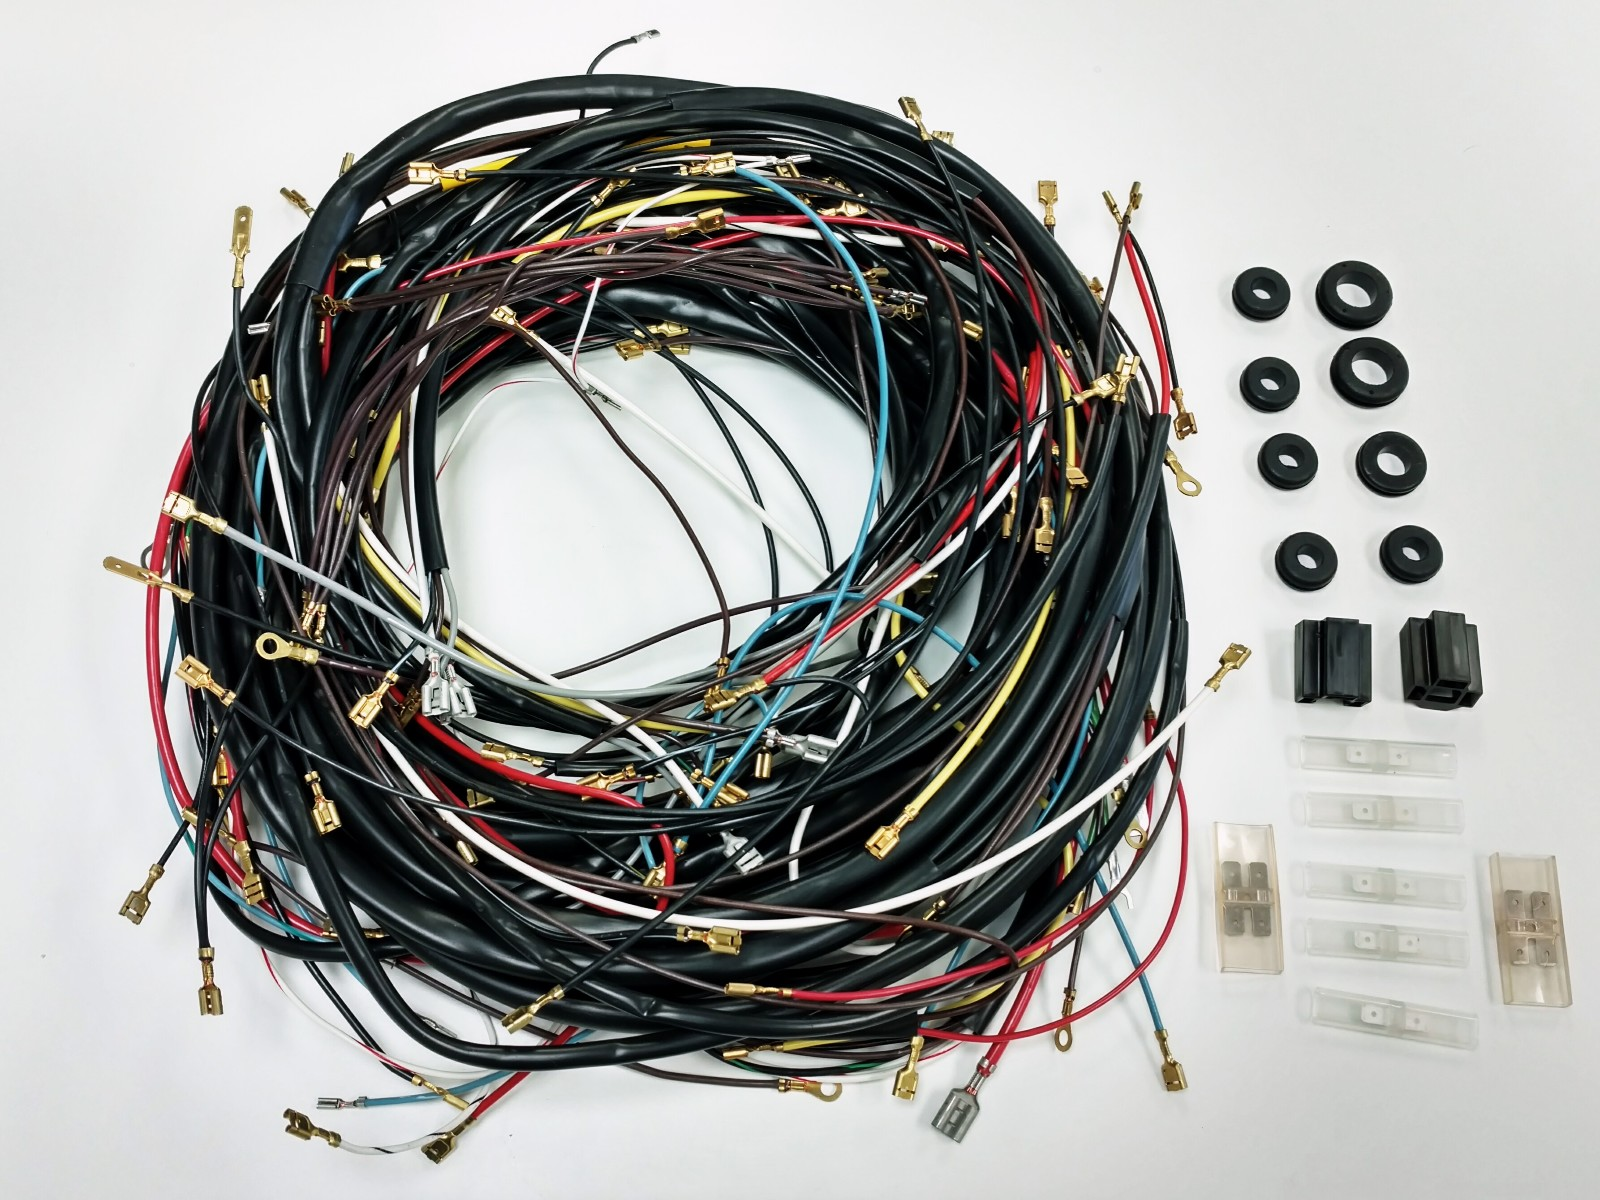 2000 Jeep Wrangler Tail Light Wiring Diagram Wiring Diagram Photos